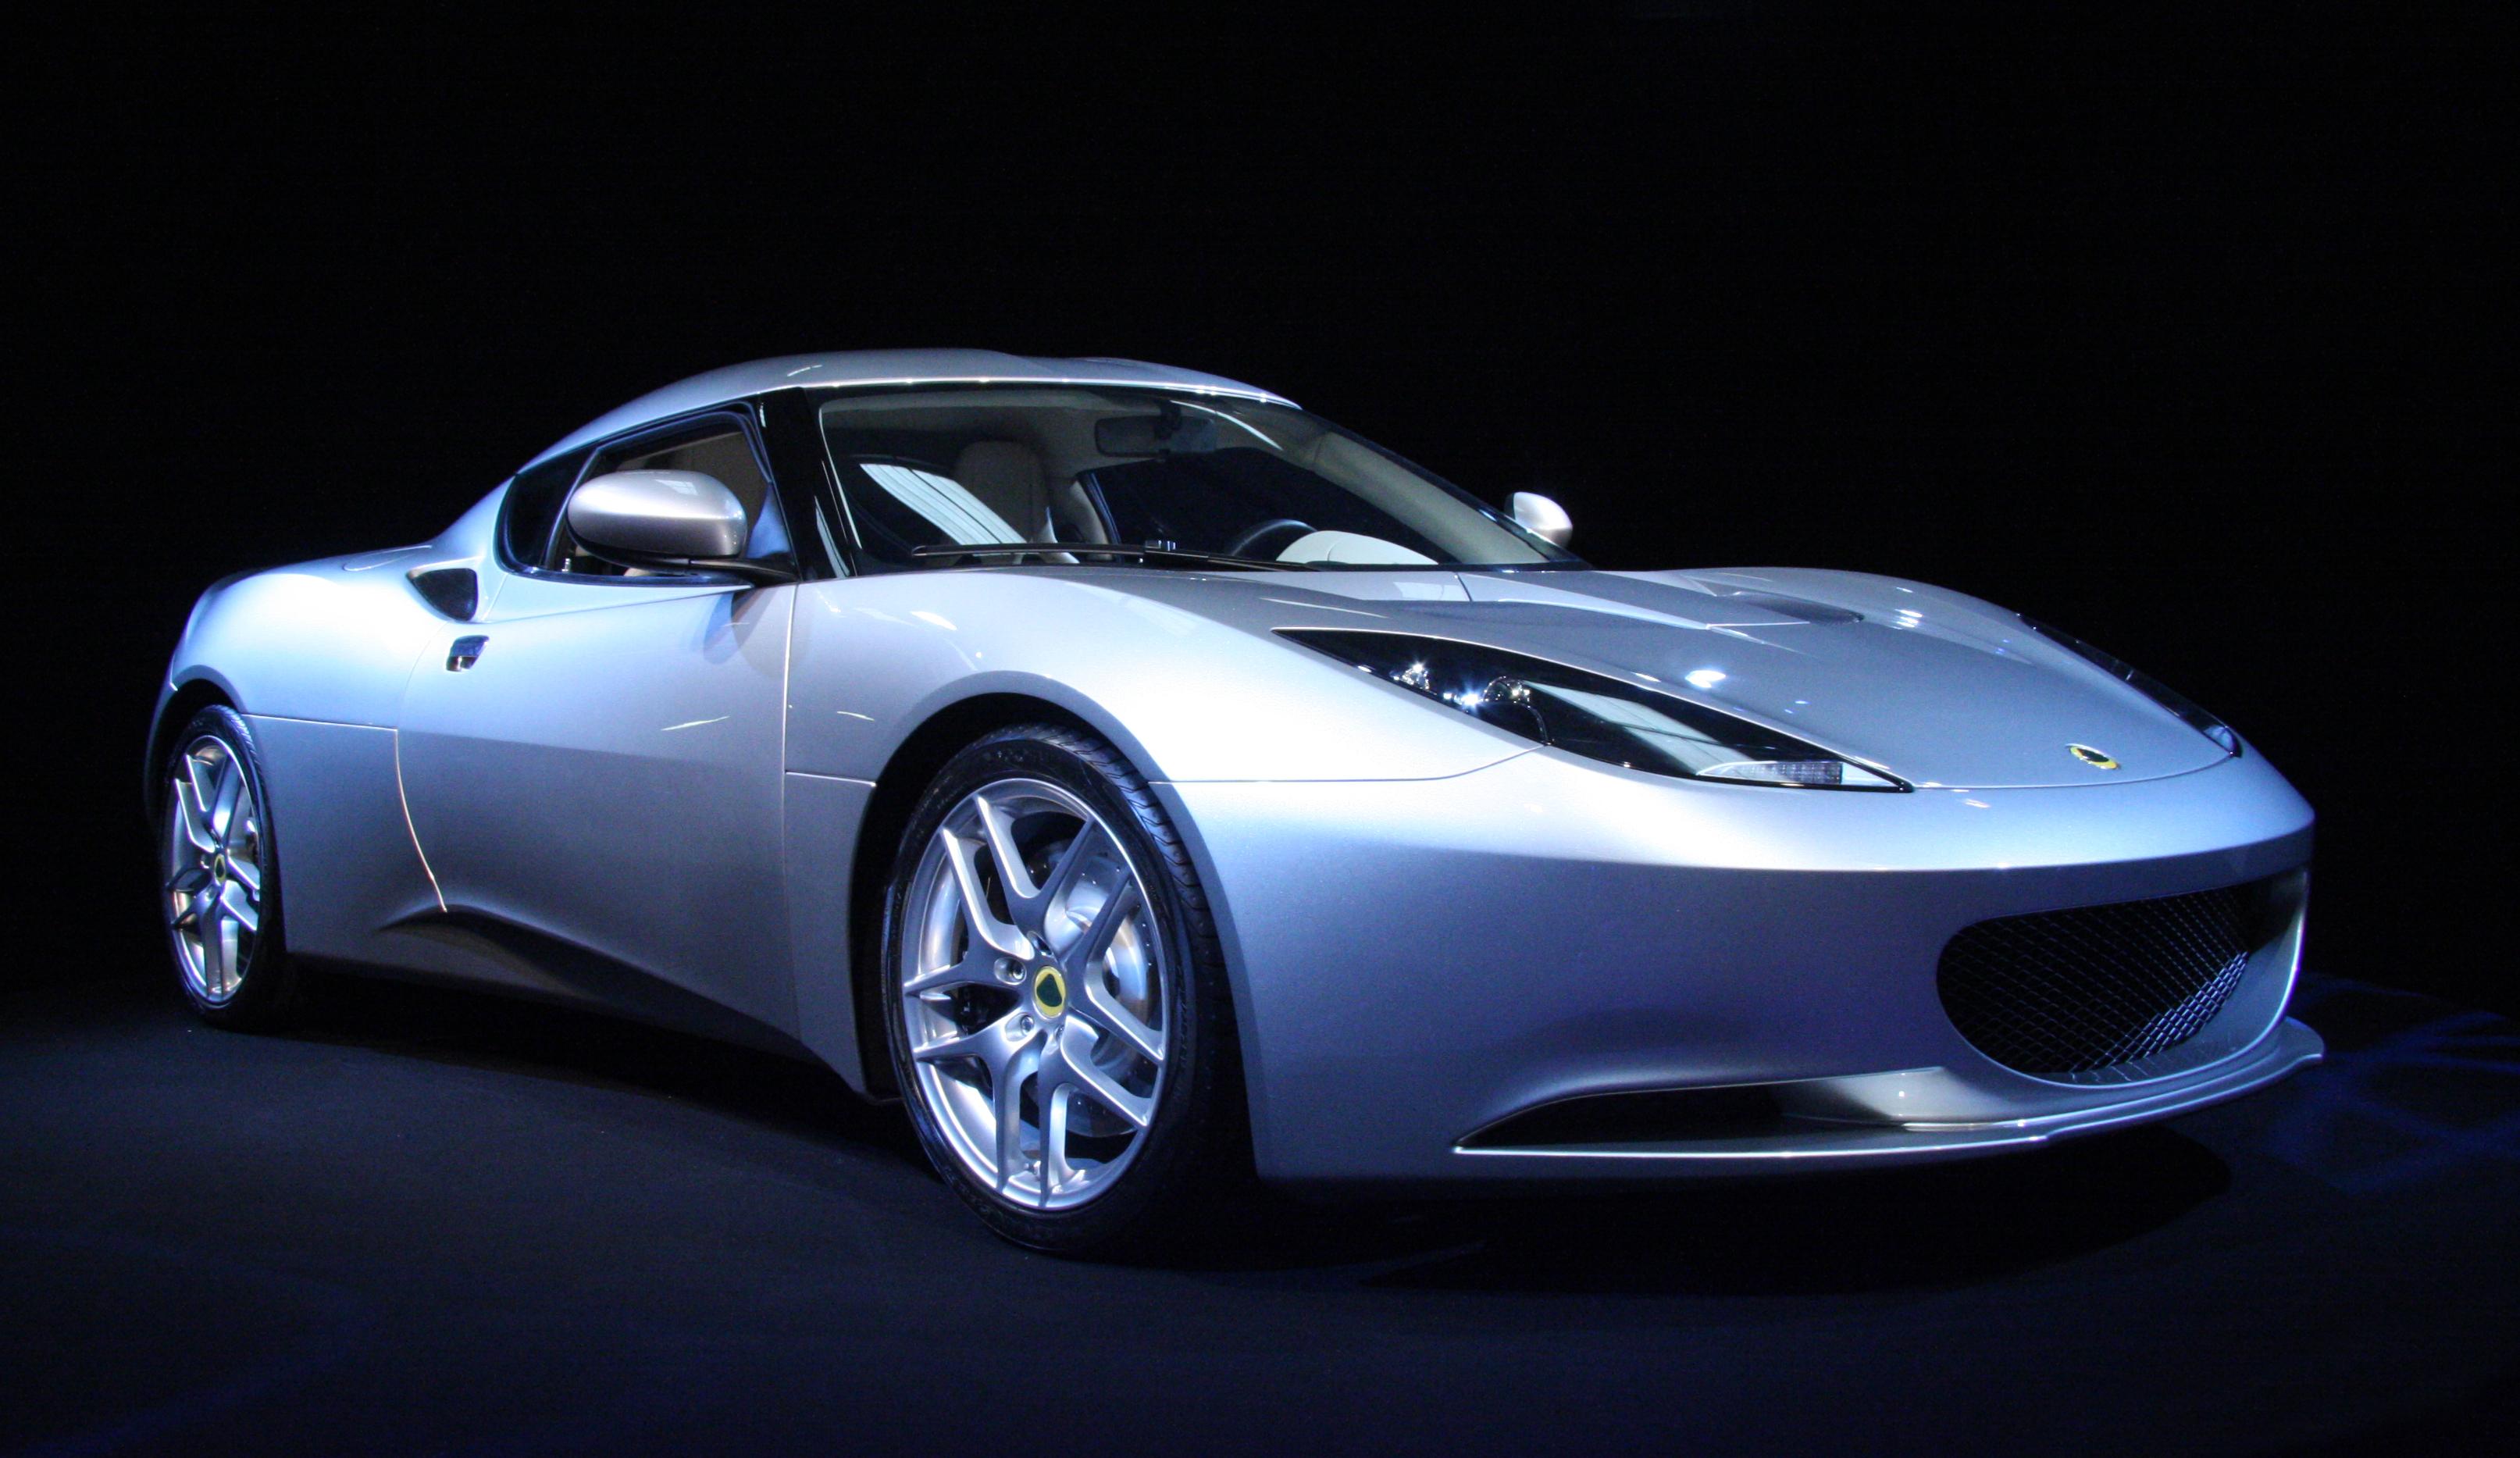 LotusEvora Mesmerizing Lotus Carlton for Sale 2015 Cars Trend